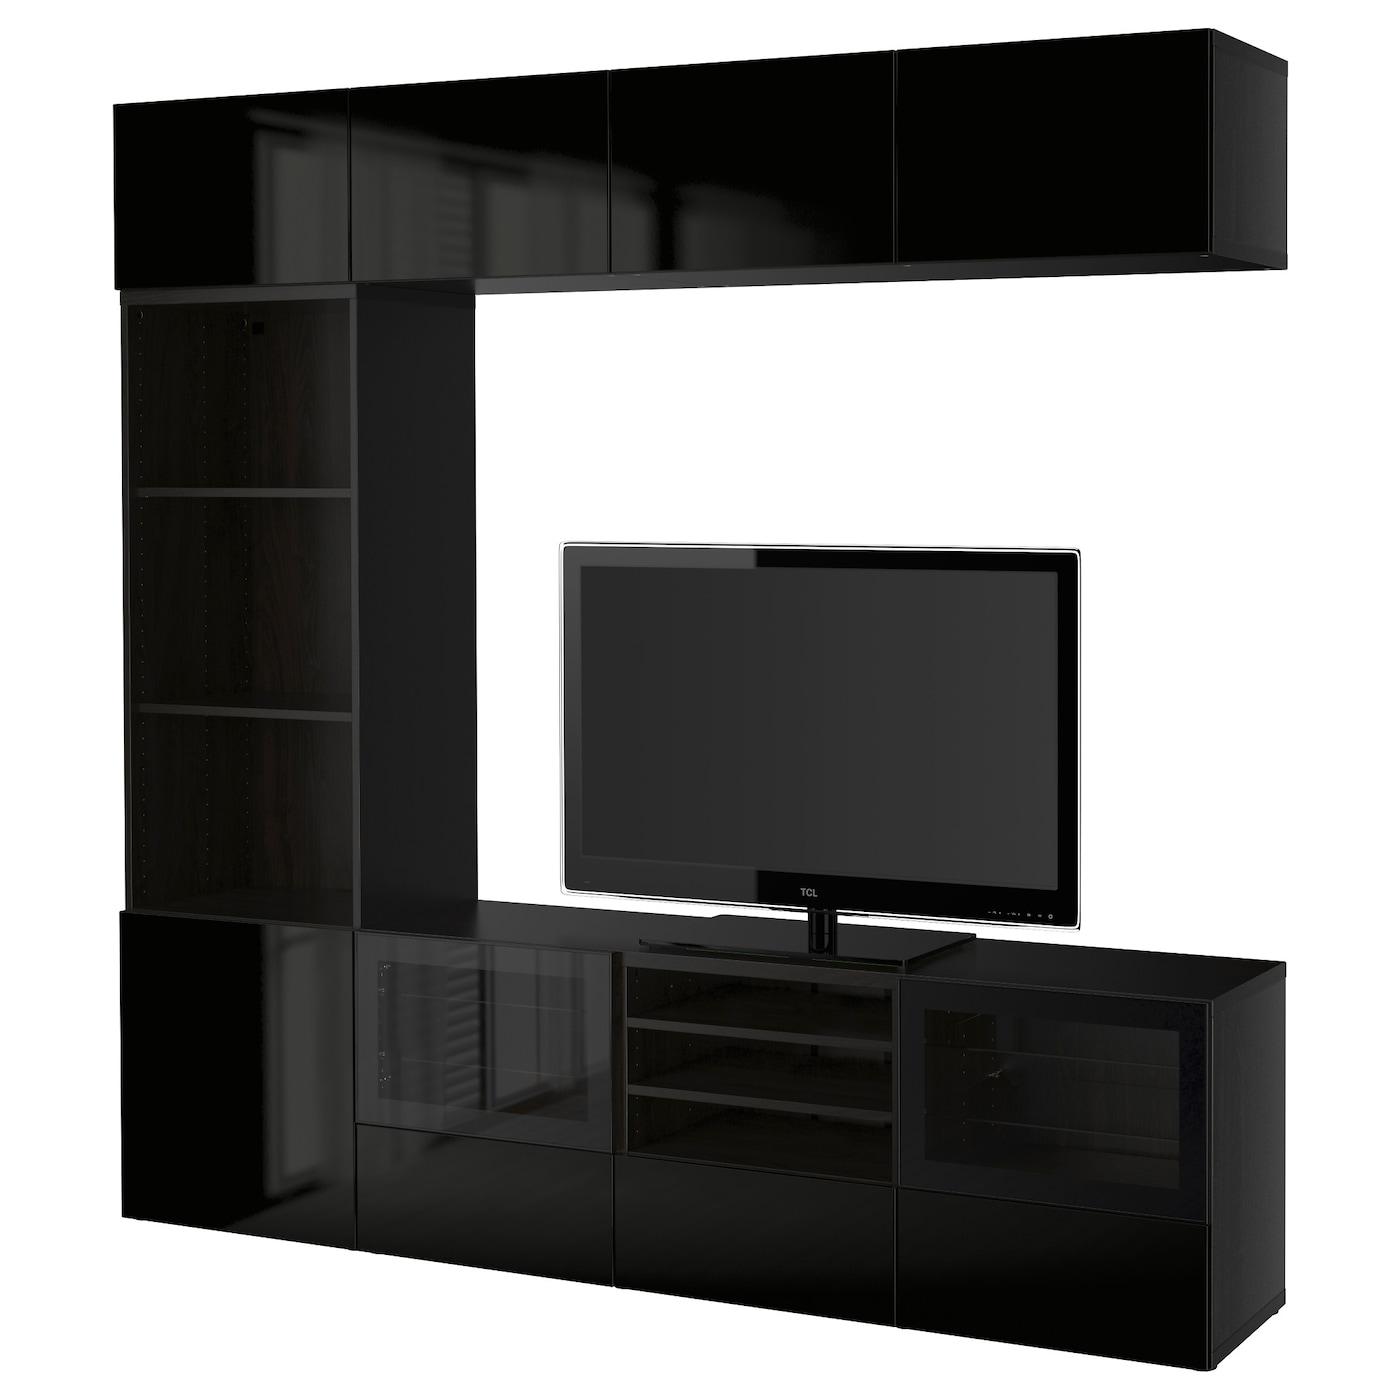 Best tv storage combination glass doors black brown for Ikea mueble para tv